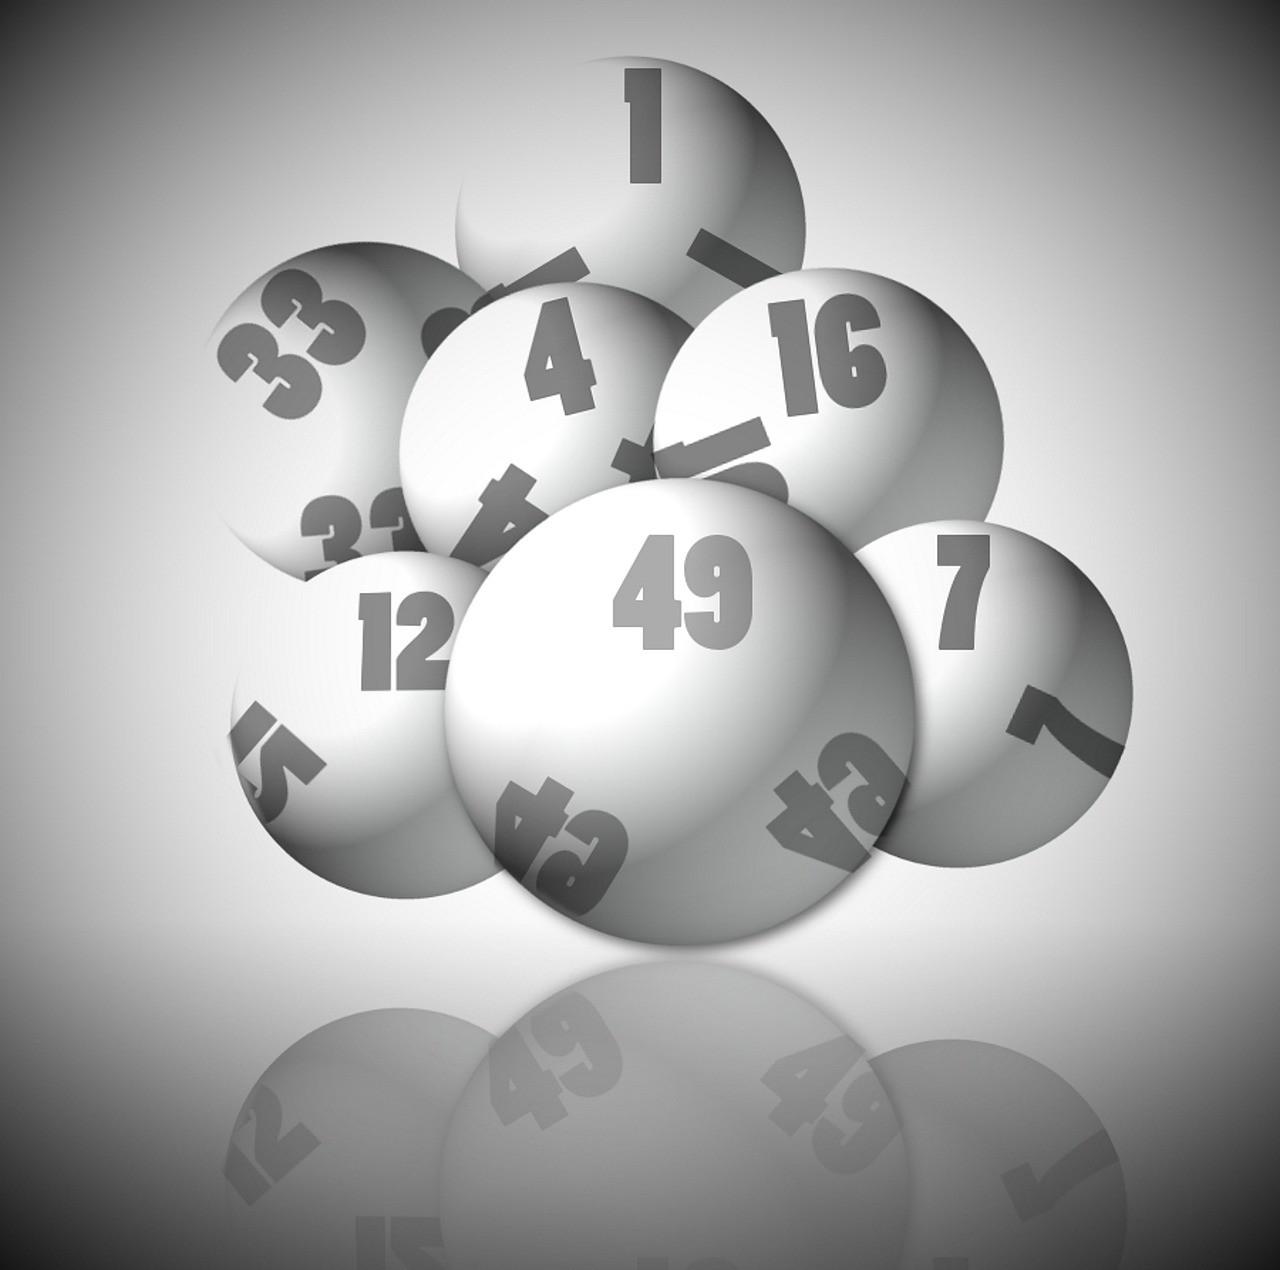 Loteria Federal 05094: confira o resultado